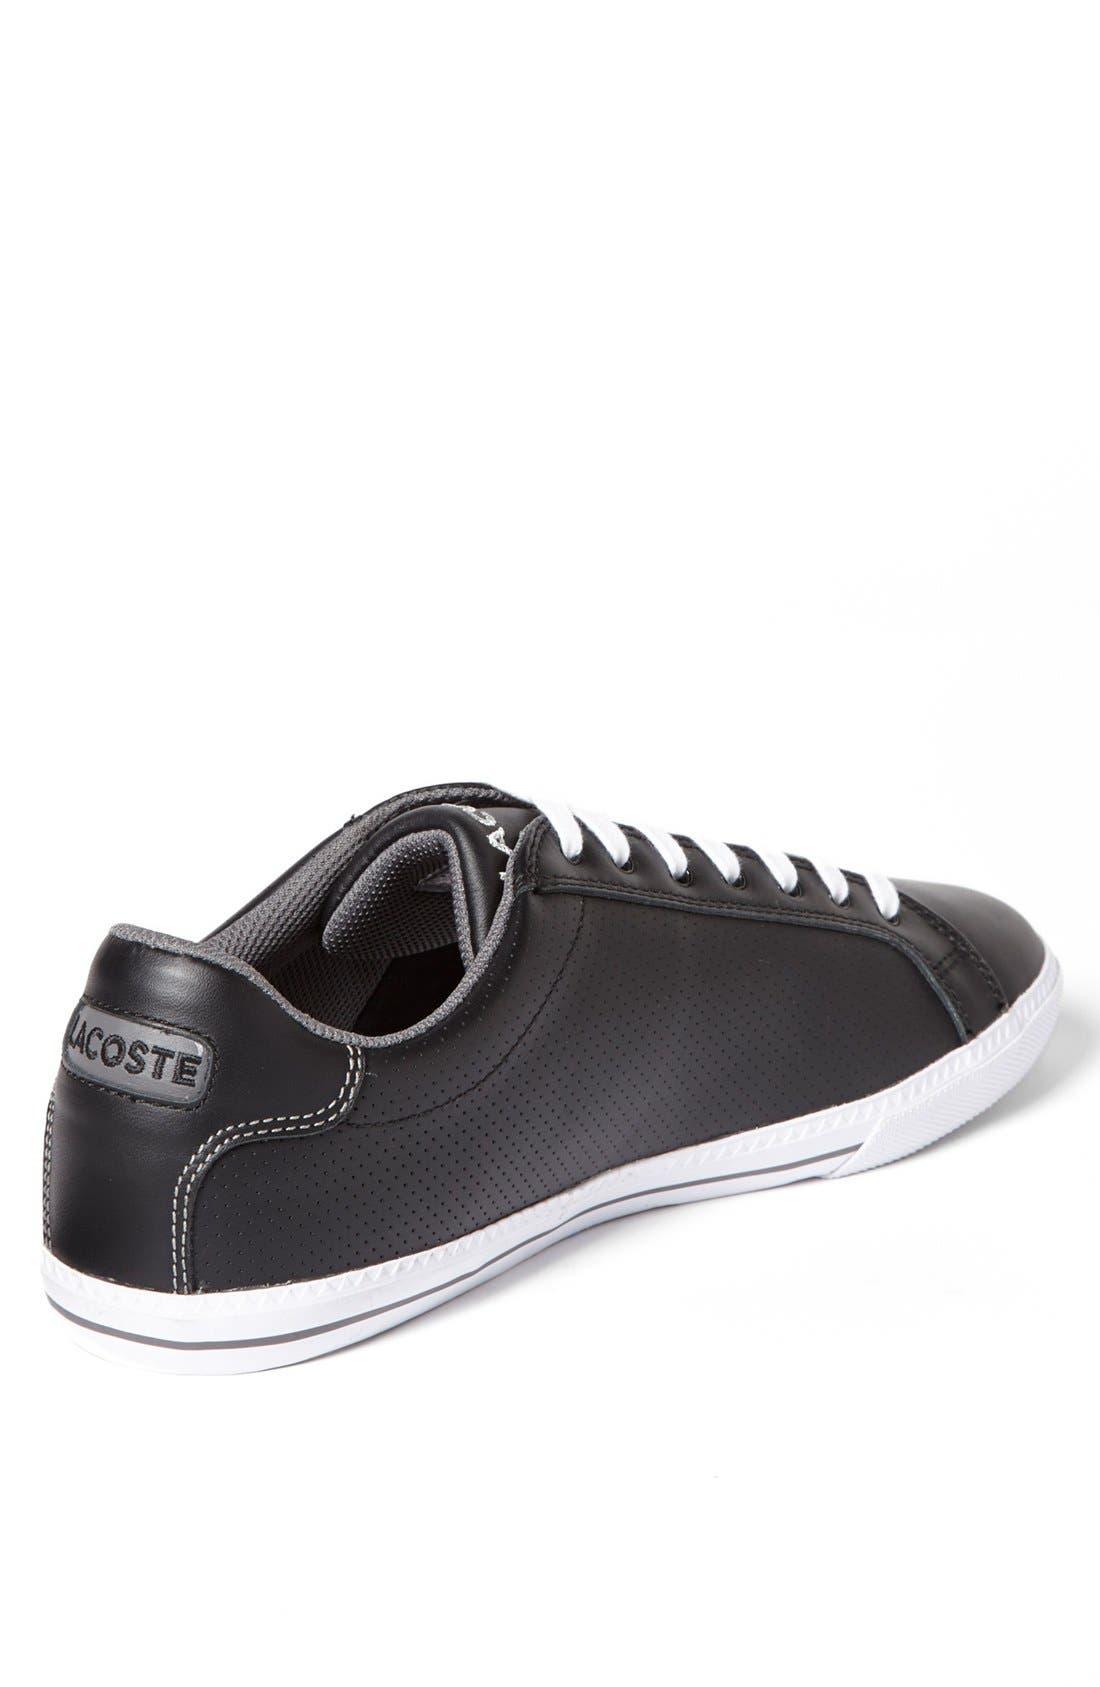 'Graduate' Sneaker,                             Alternate thumbnail 2, color,                             002